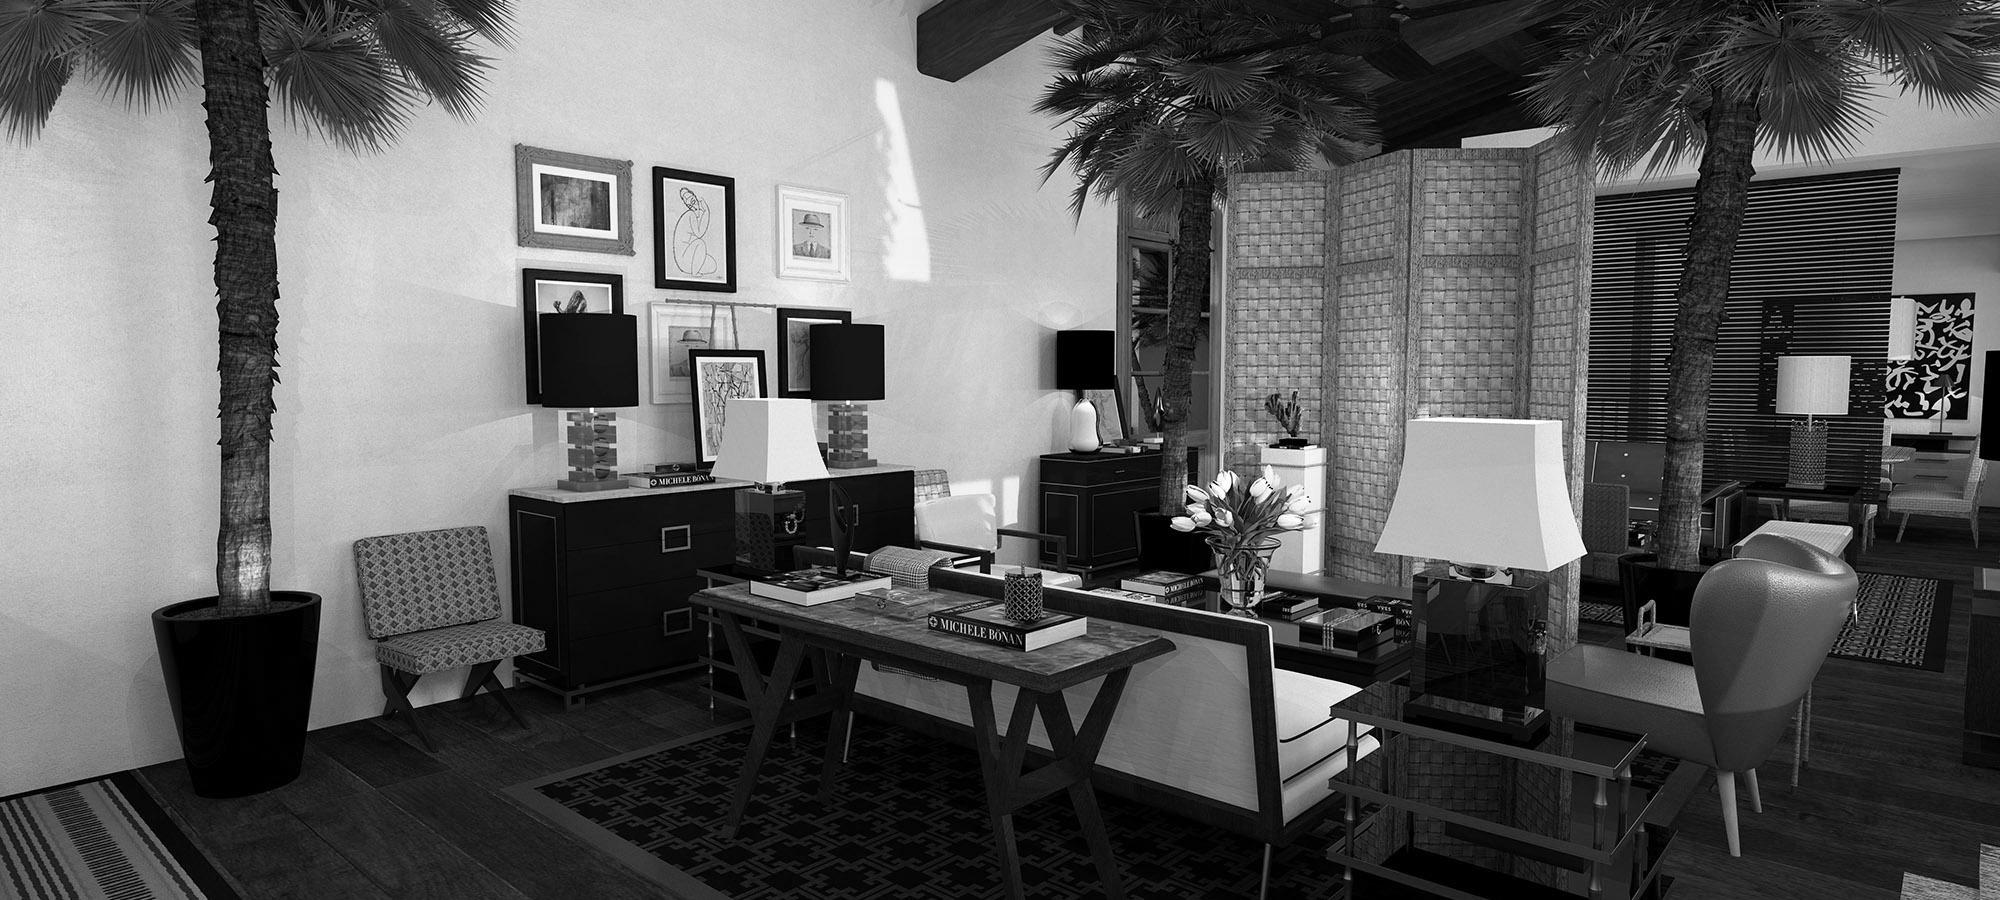 michele-bonan-interiors-showroom-2-bw-1